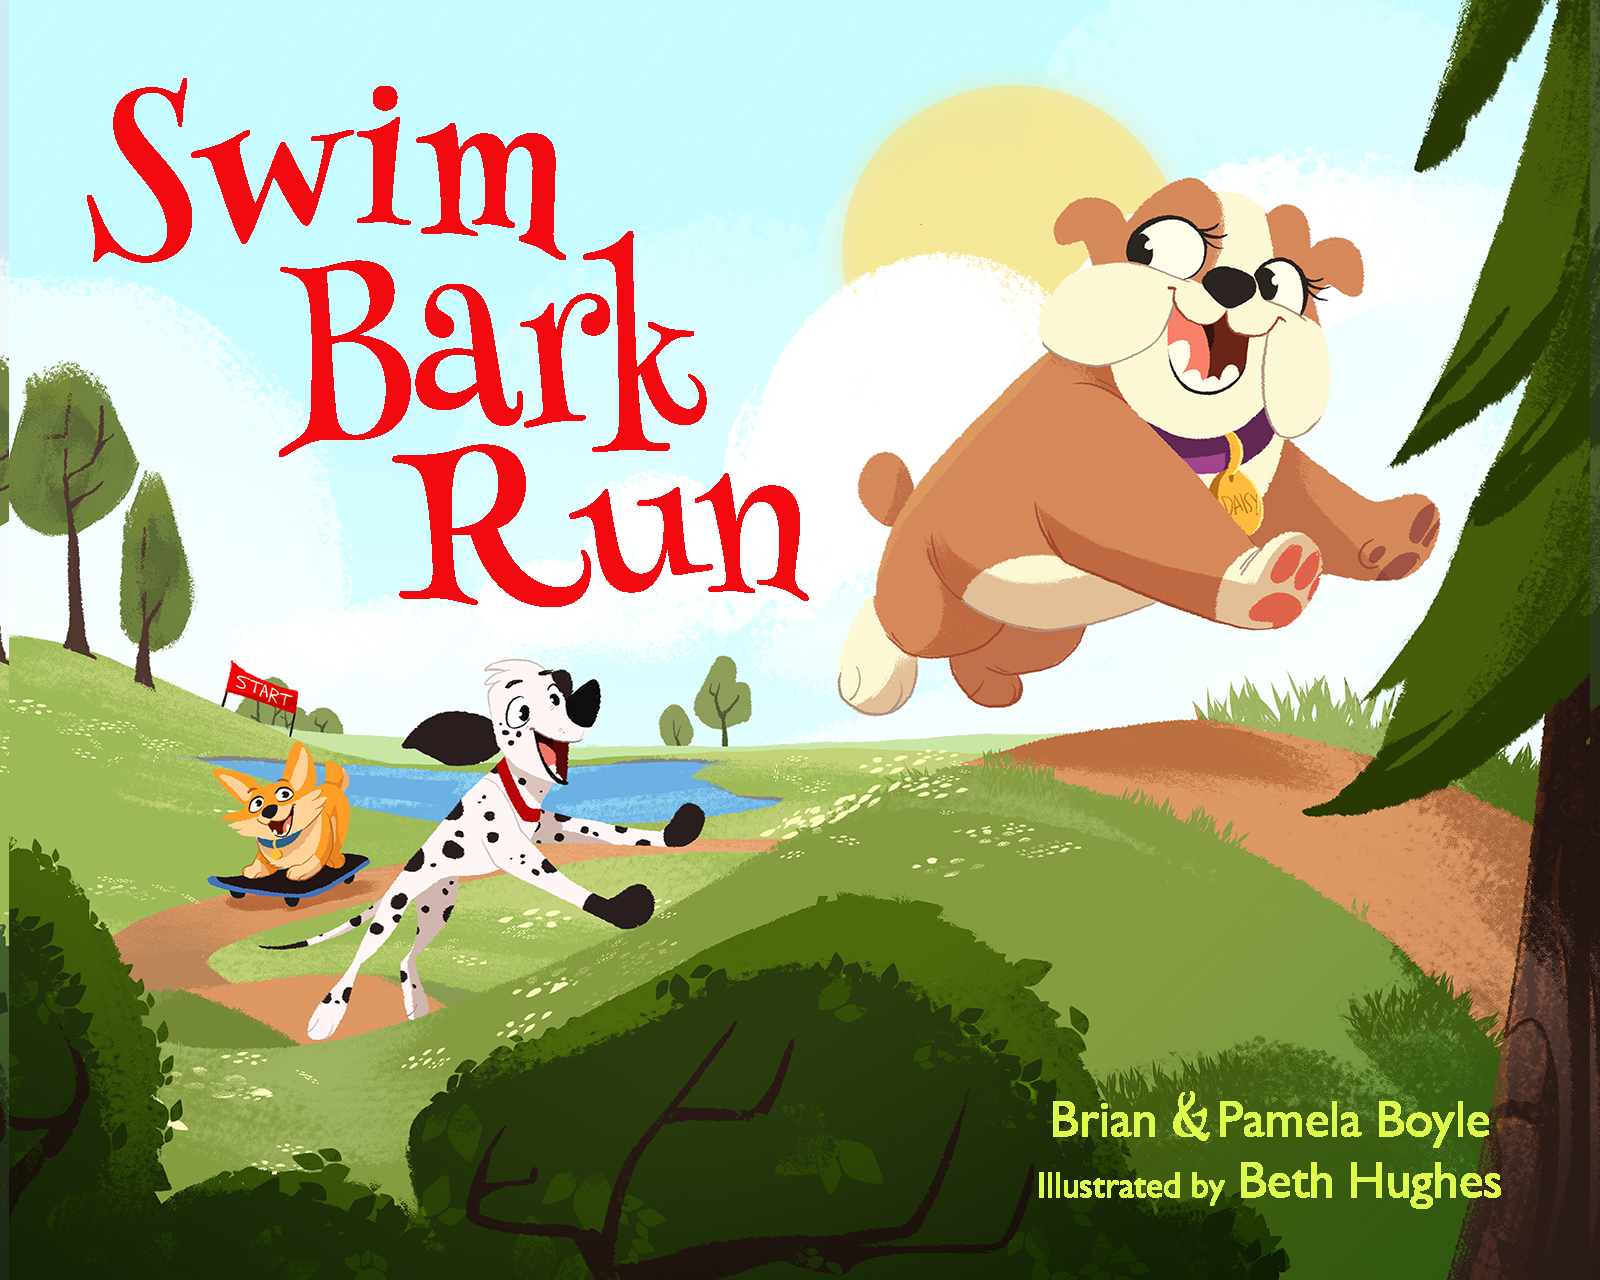 Swim Bark Run book cover art